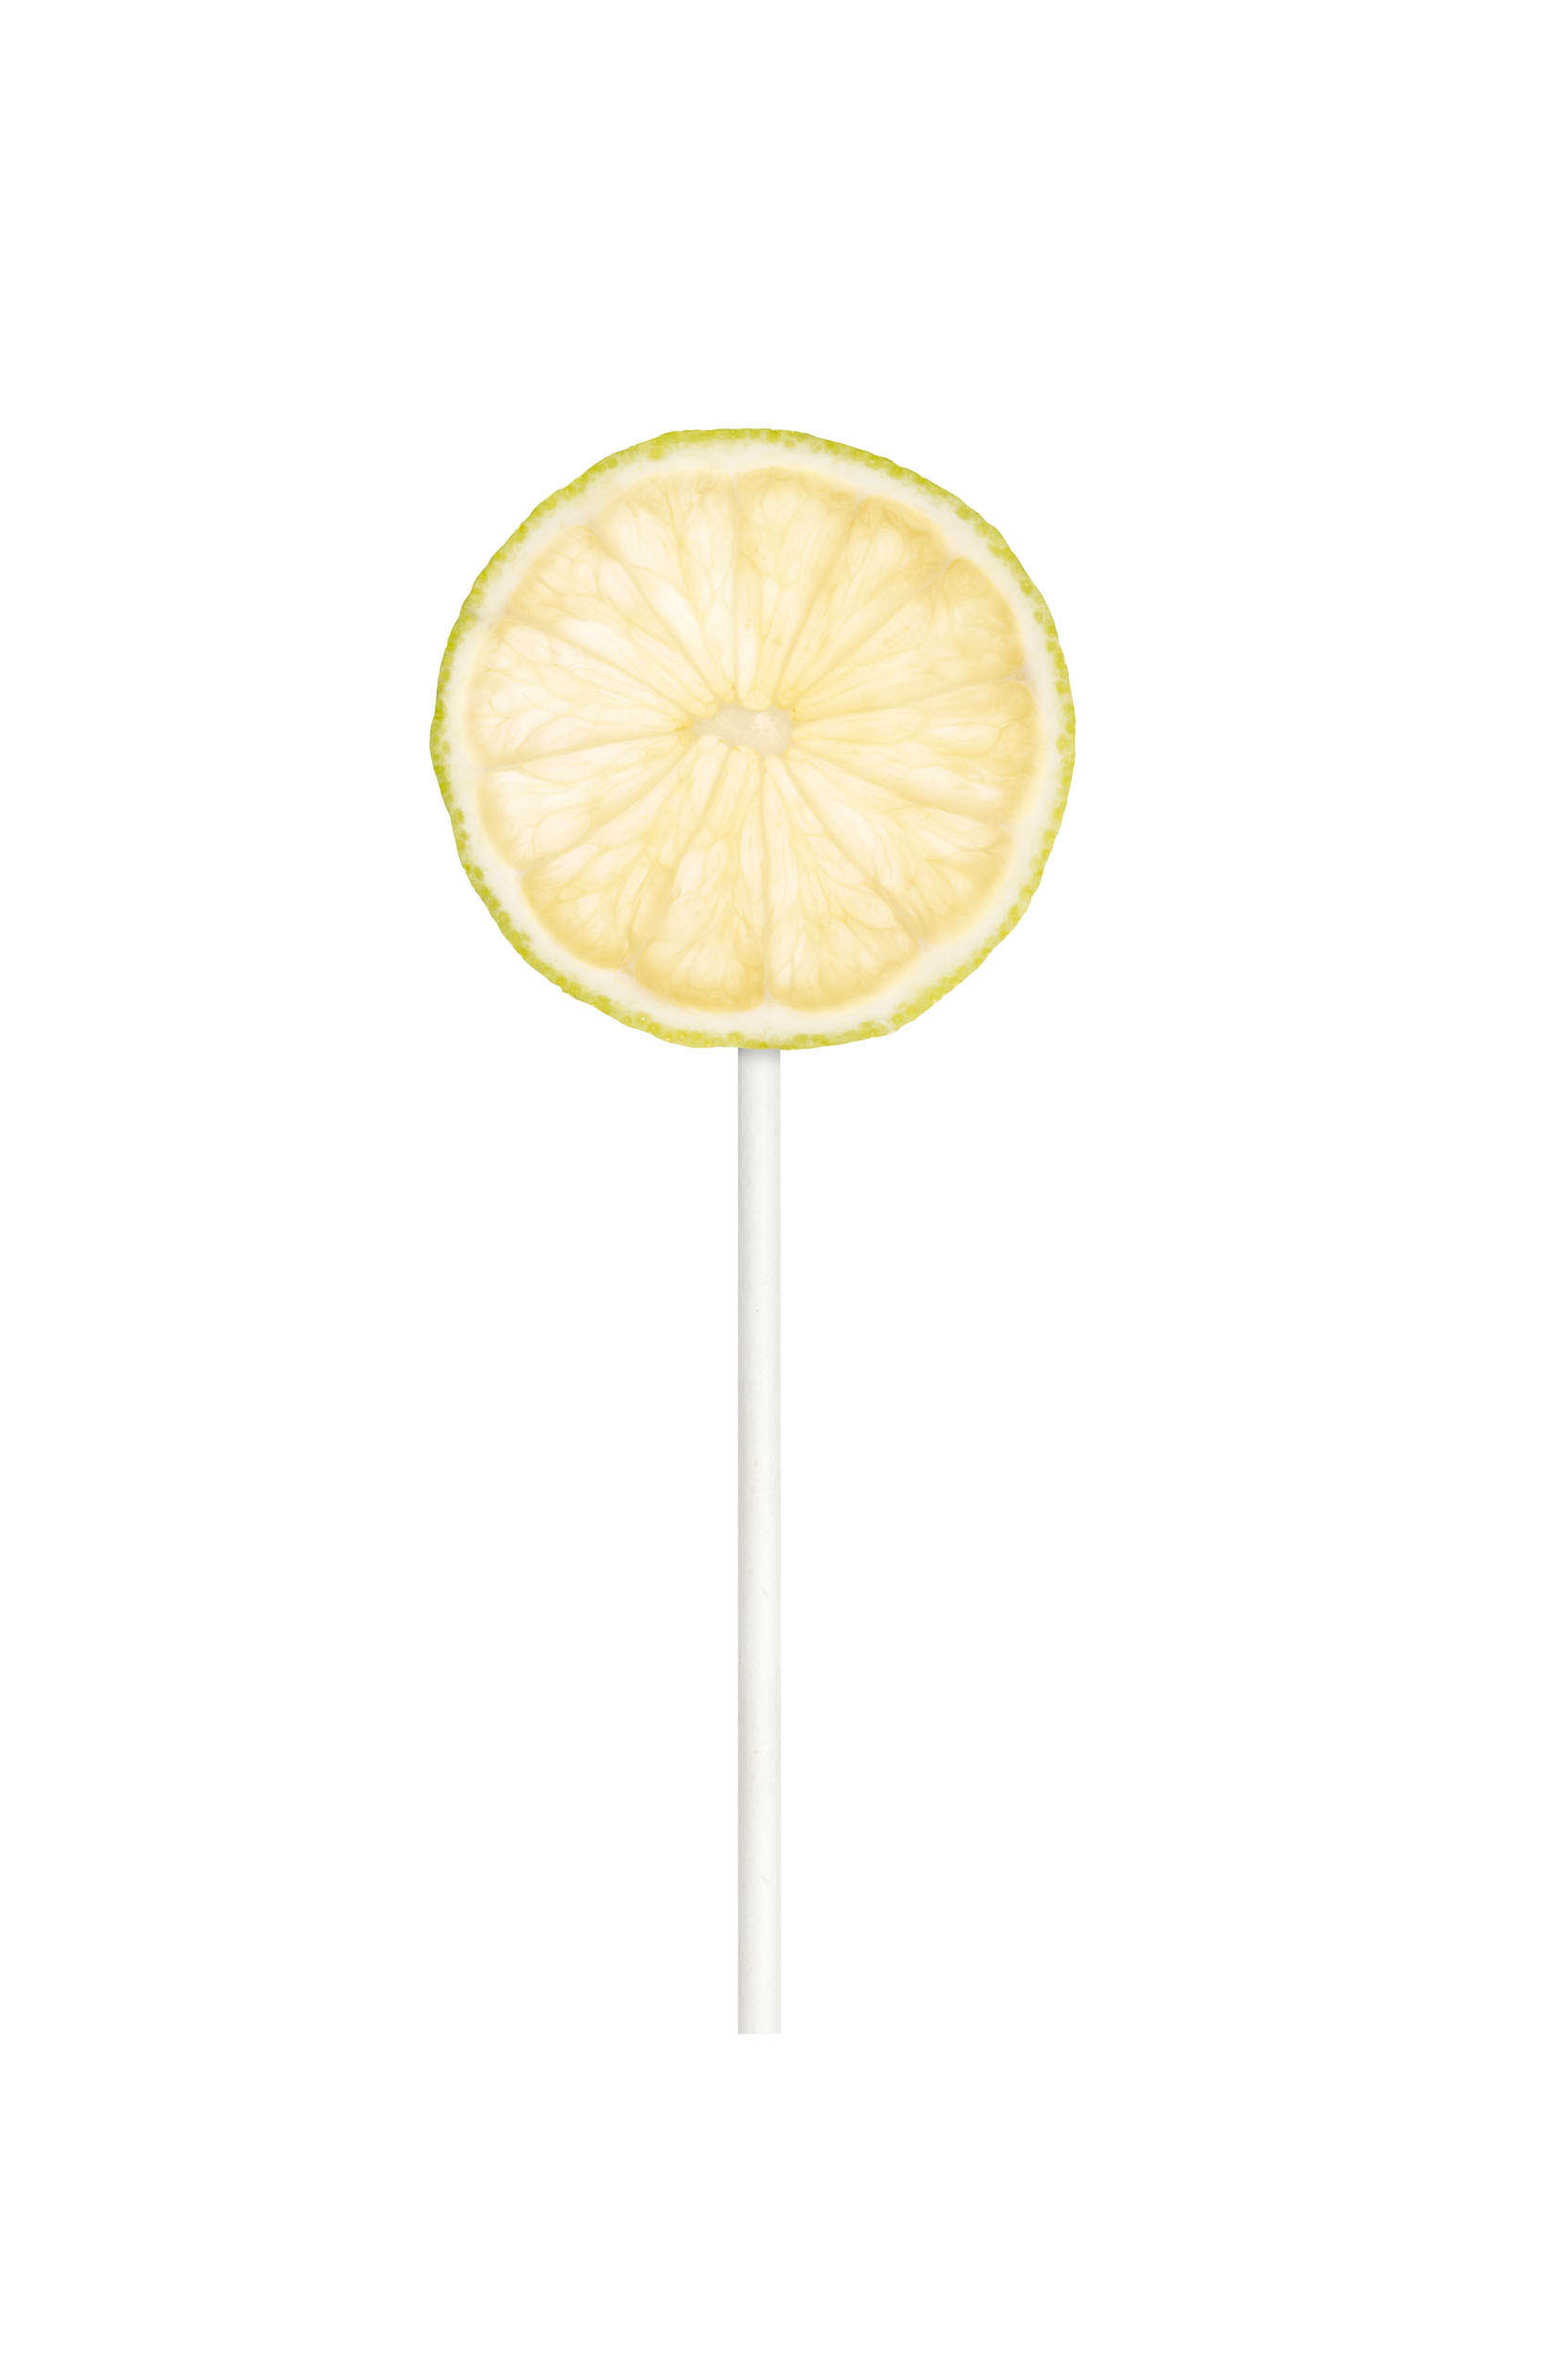 Lollipop-026.jpg